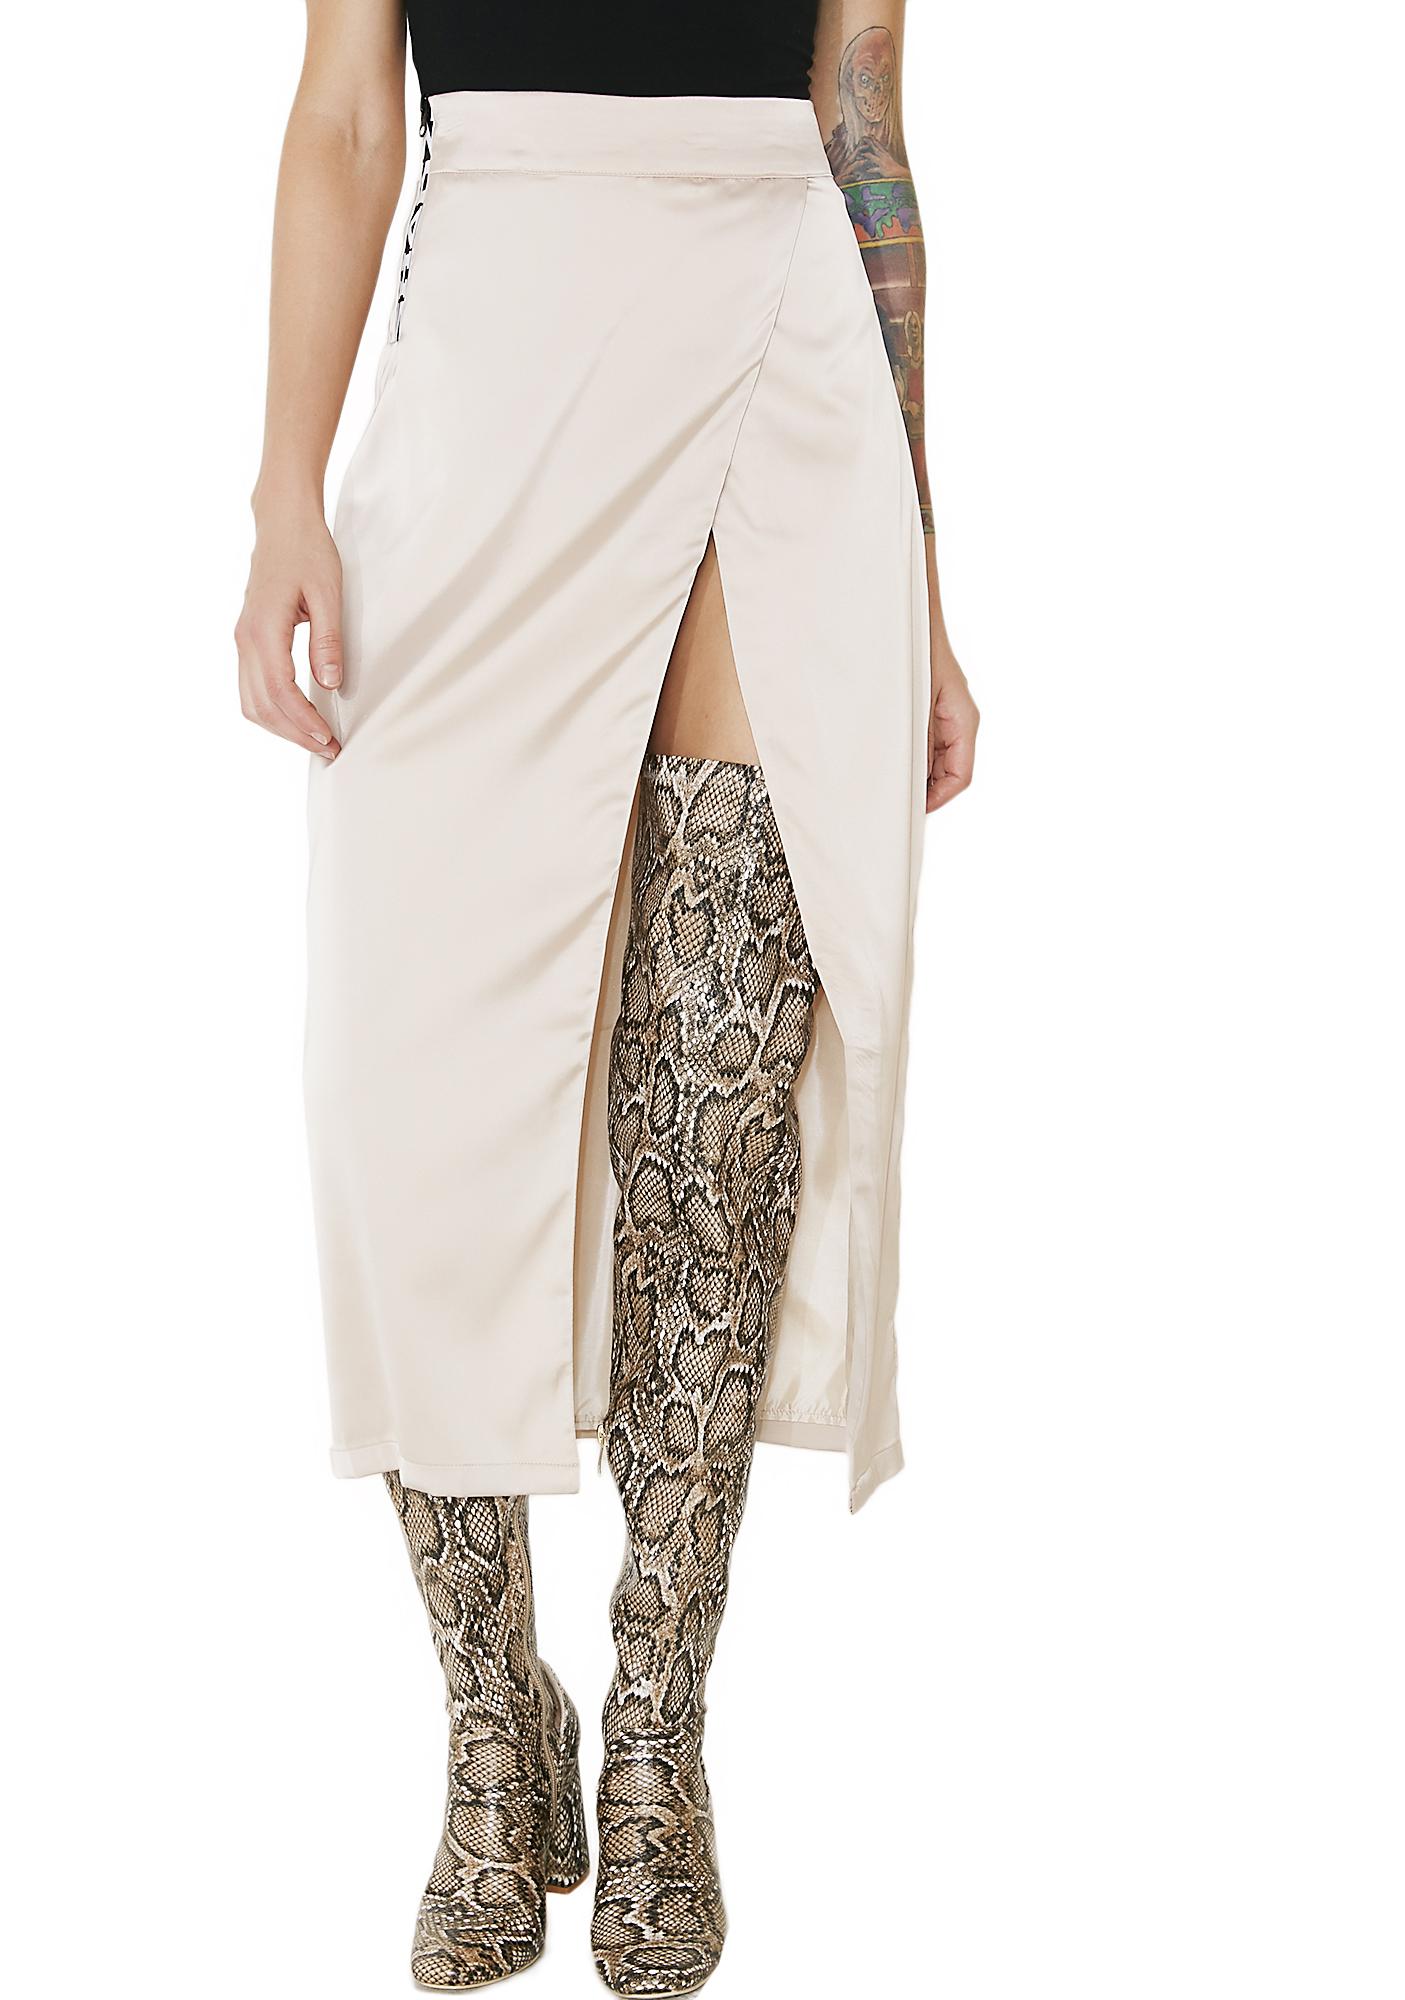 Shade London Zip High Slit Skirt